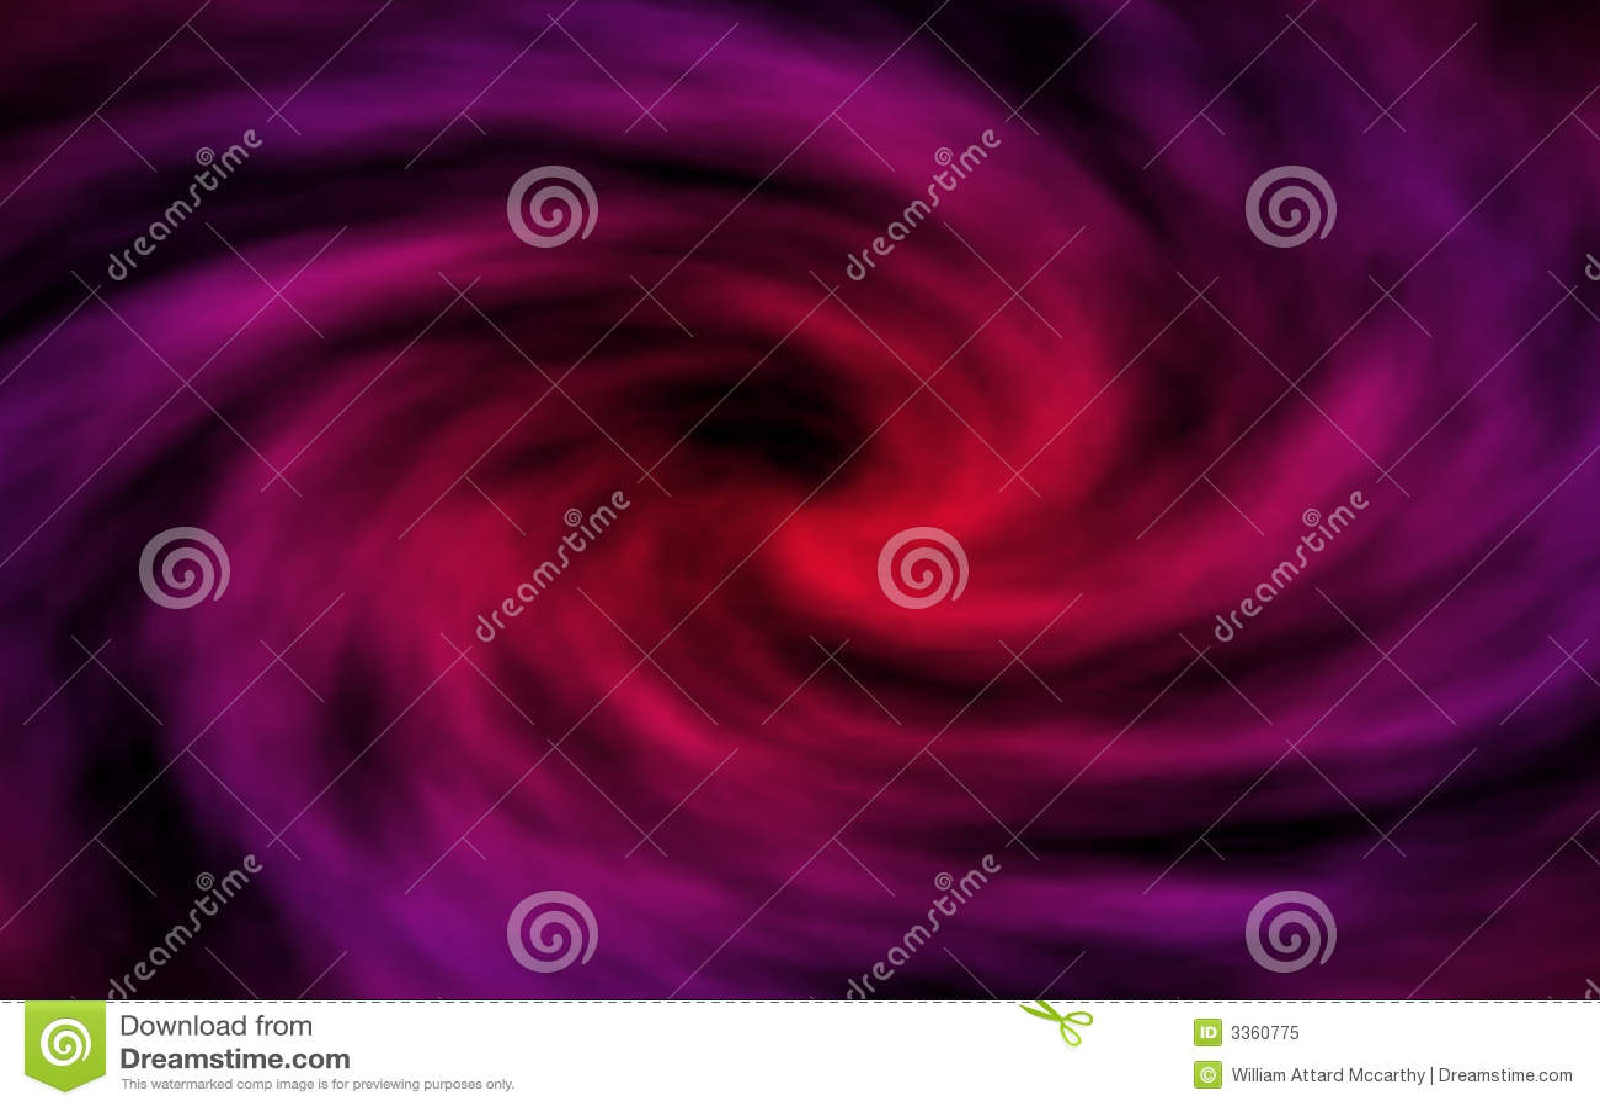 Stocks Download Shivam Creation: Vortex Stock Image. Image Of Astronomy, Creation, Nova